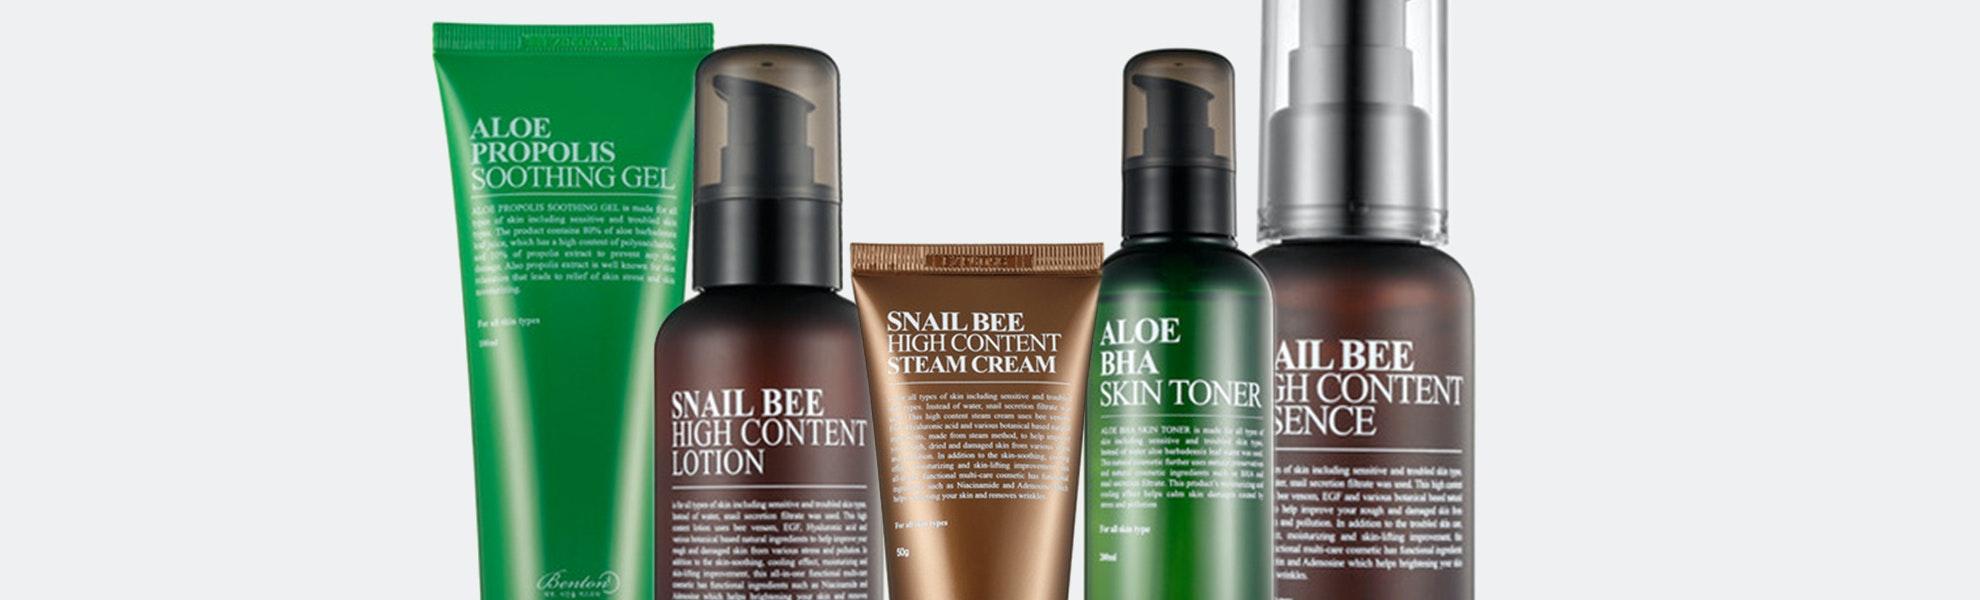 Benton Snail & Aloe Daily Skincare Set